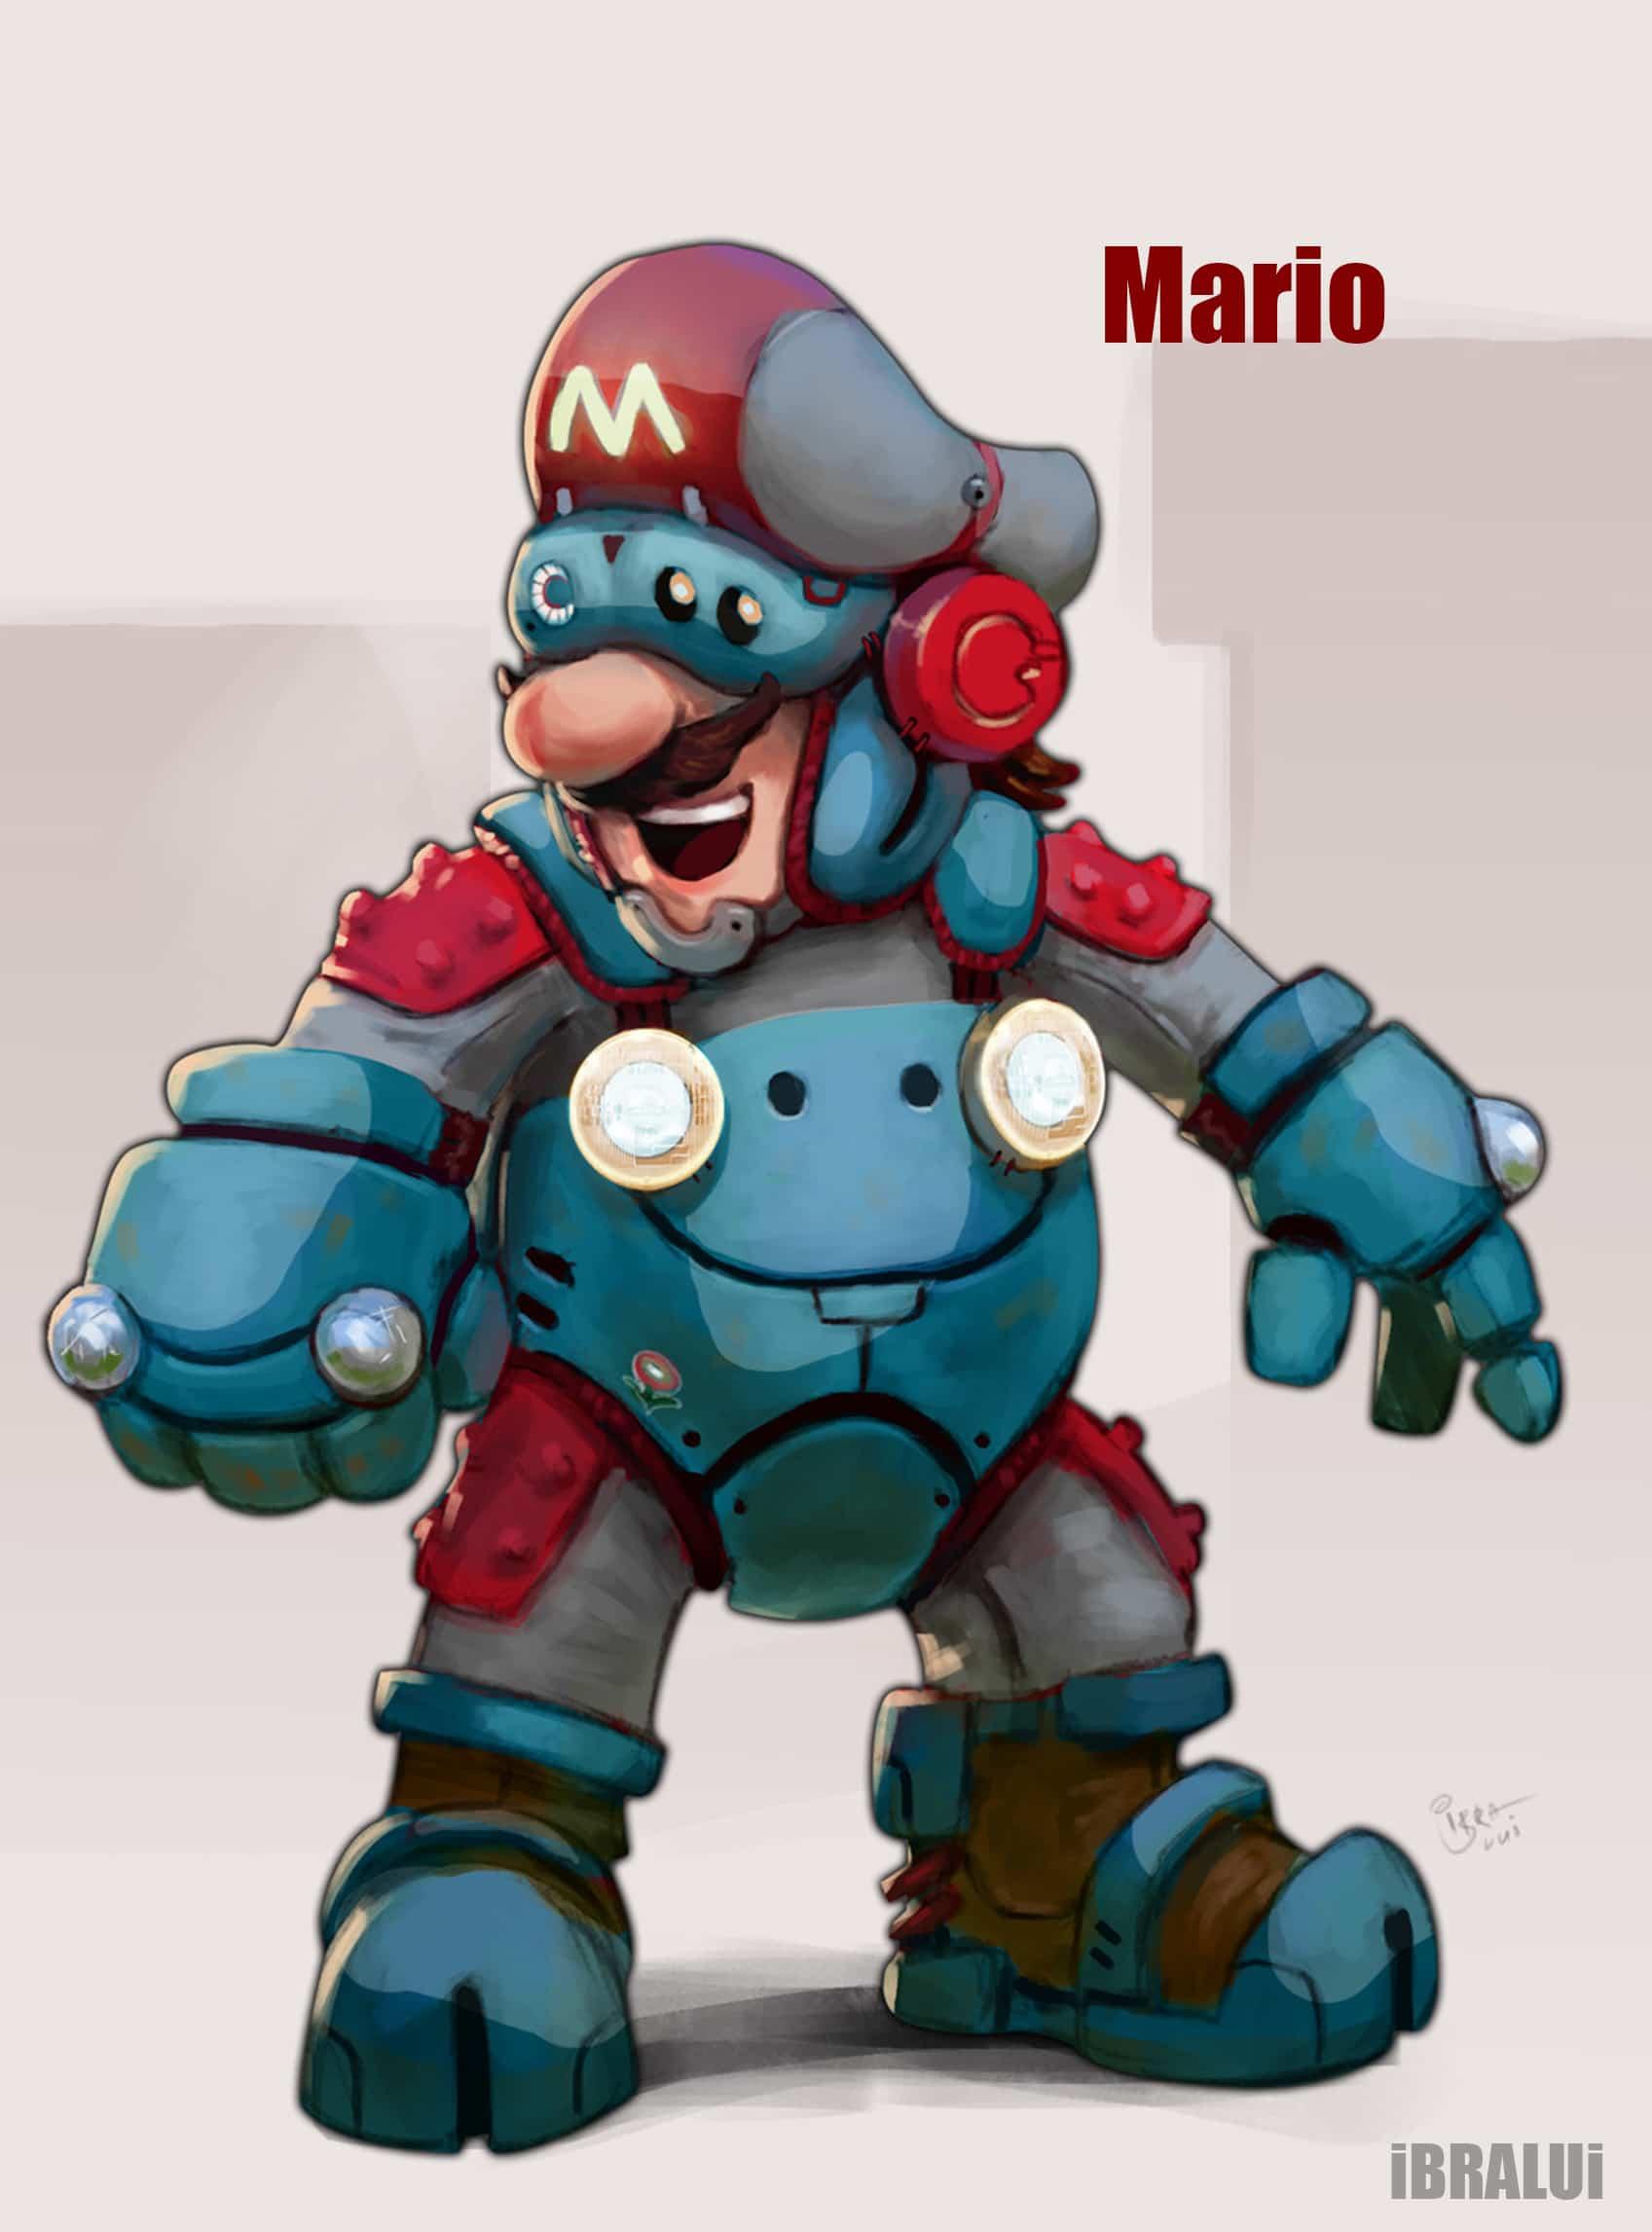 cyborg Mario - Super mario world